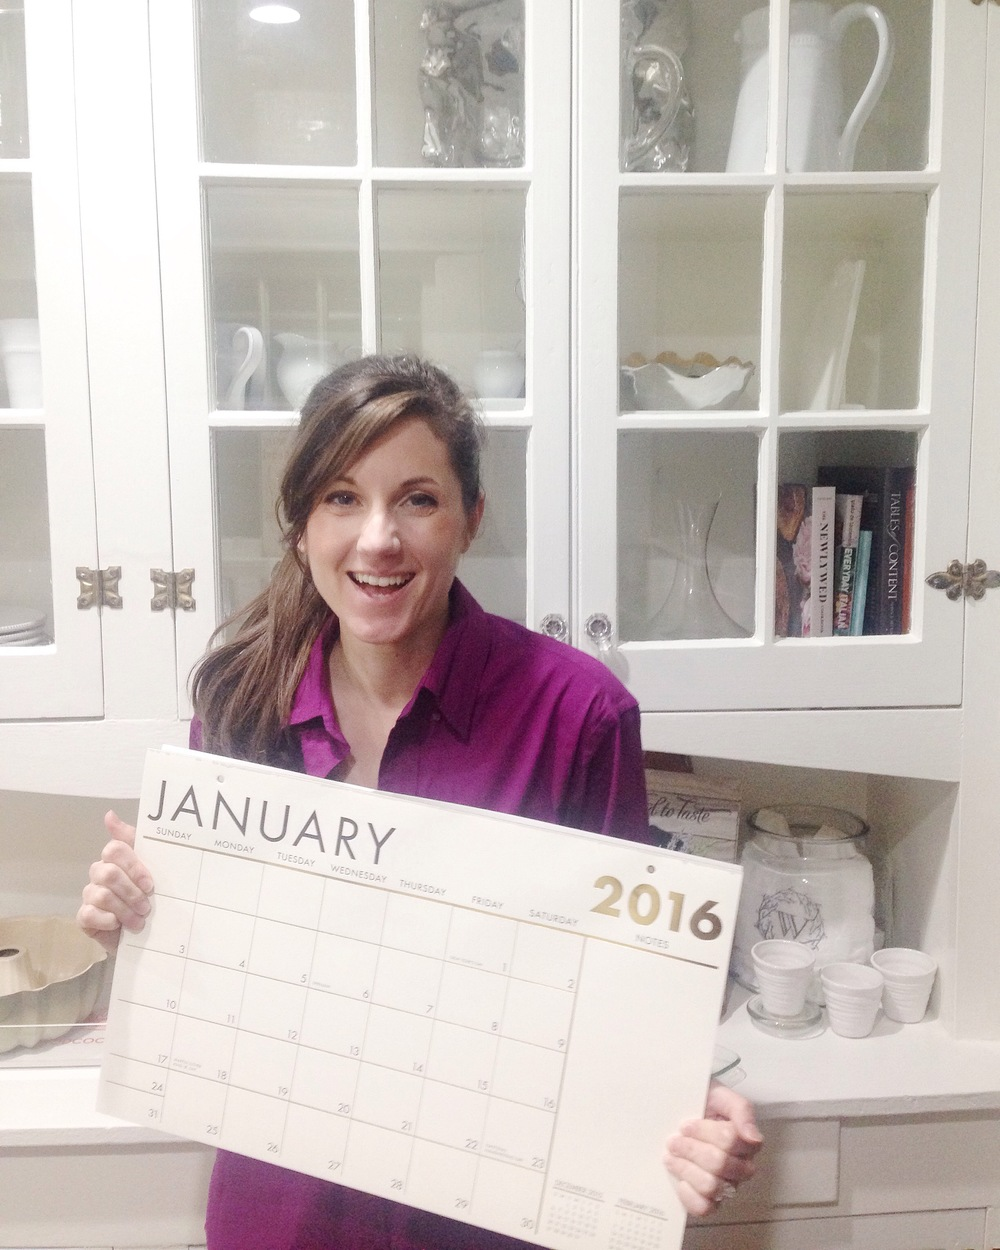 2016 calendar The LovingKind